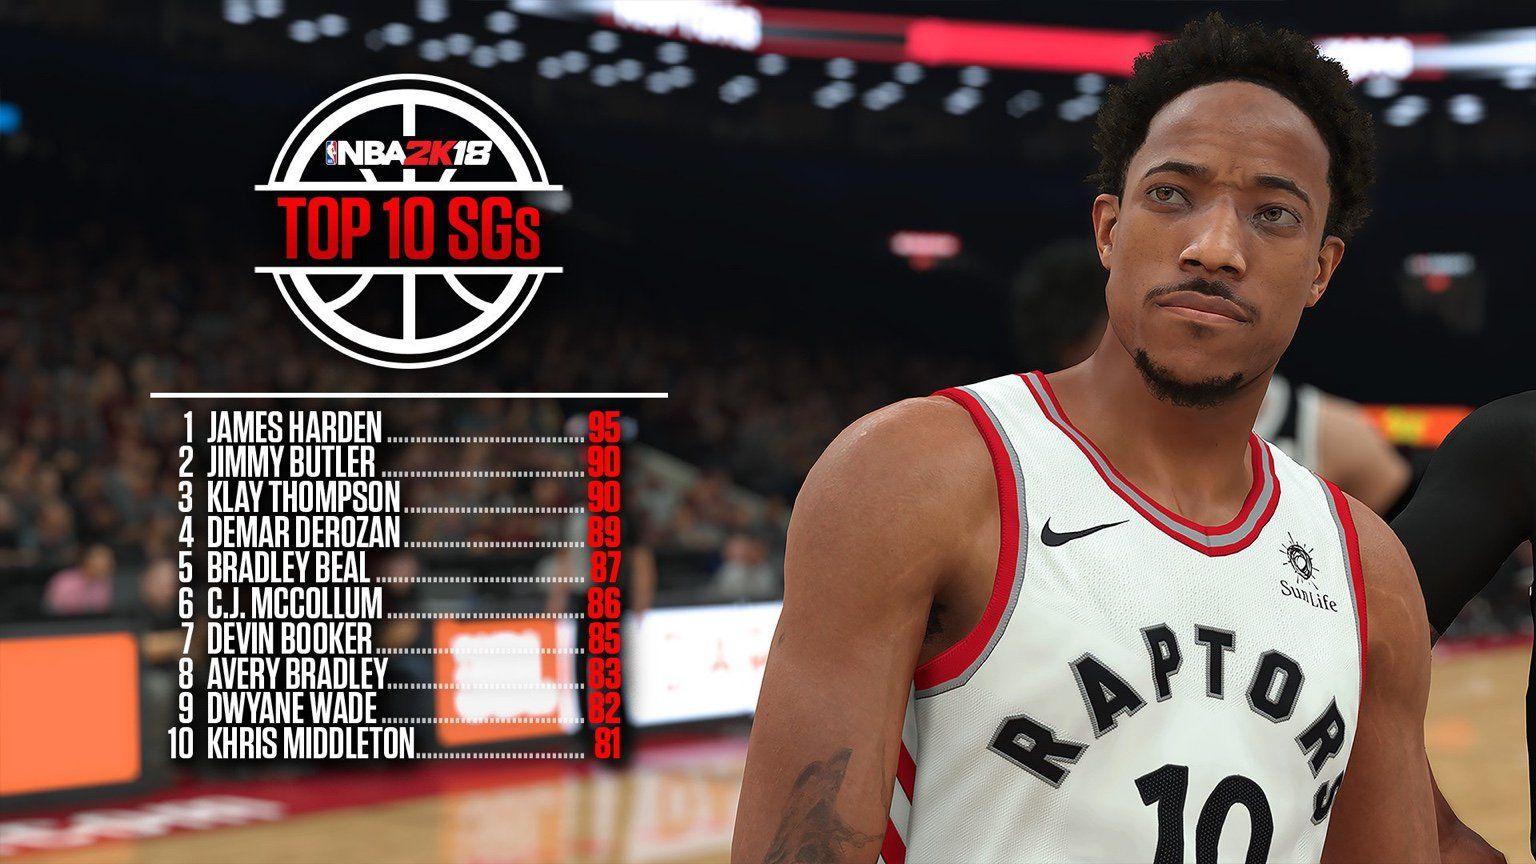 NBA 2K18 shooting guard ratings